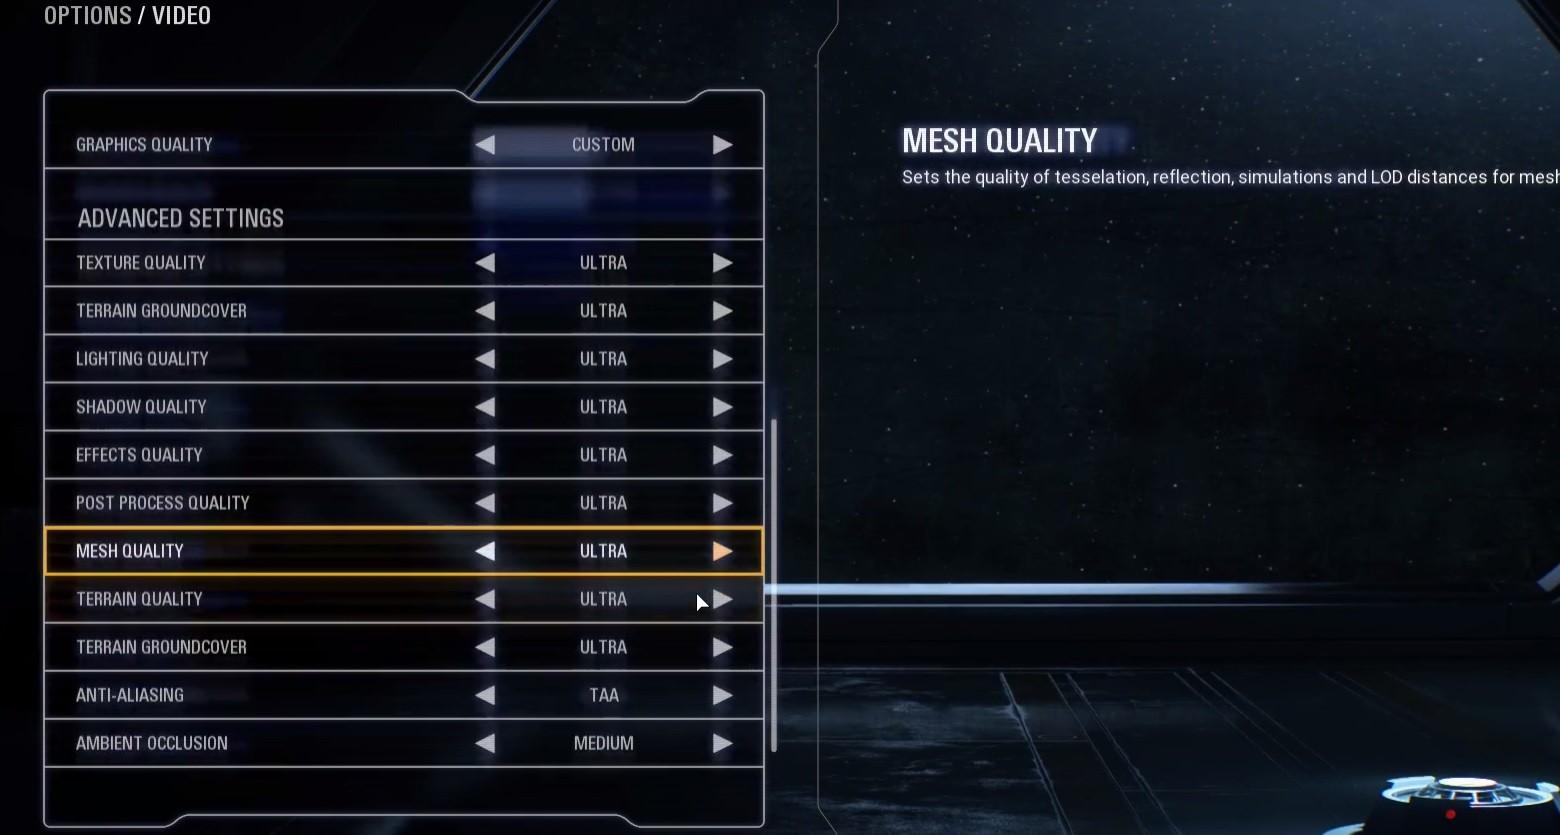 Star Wars Battlefront 2 settings